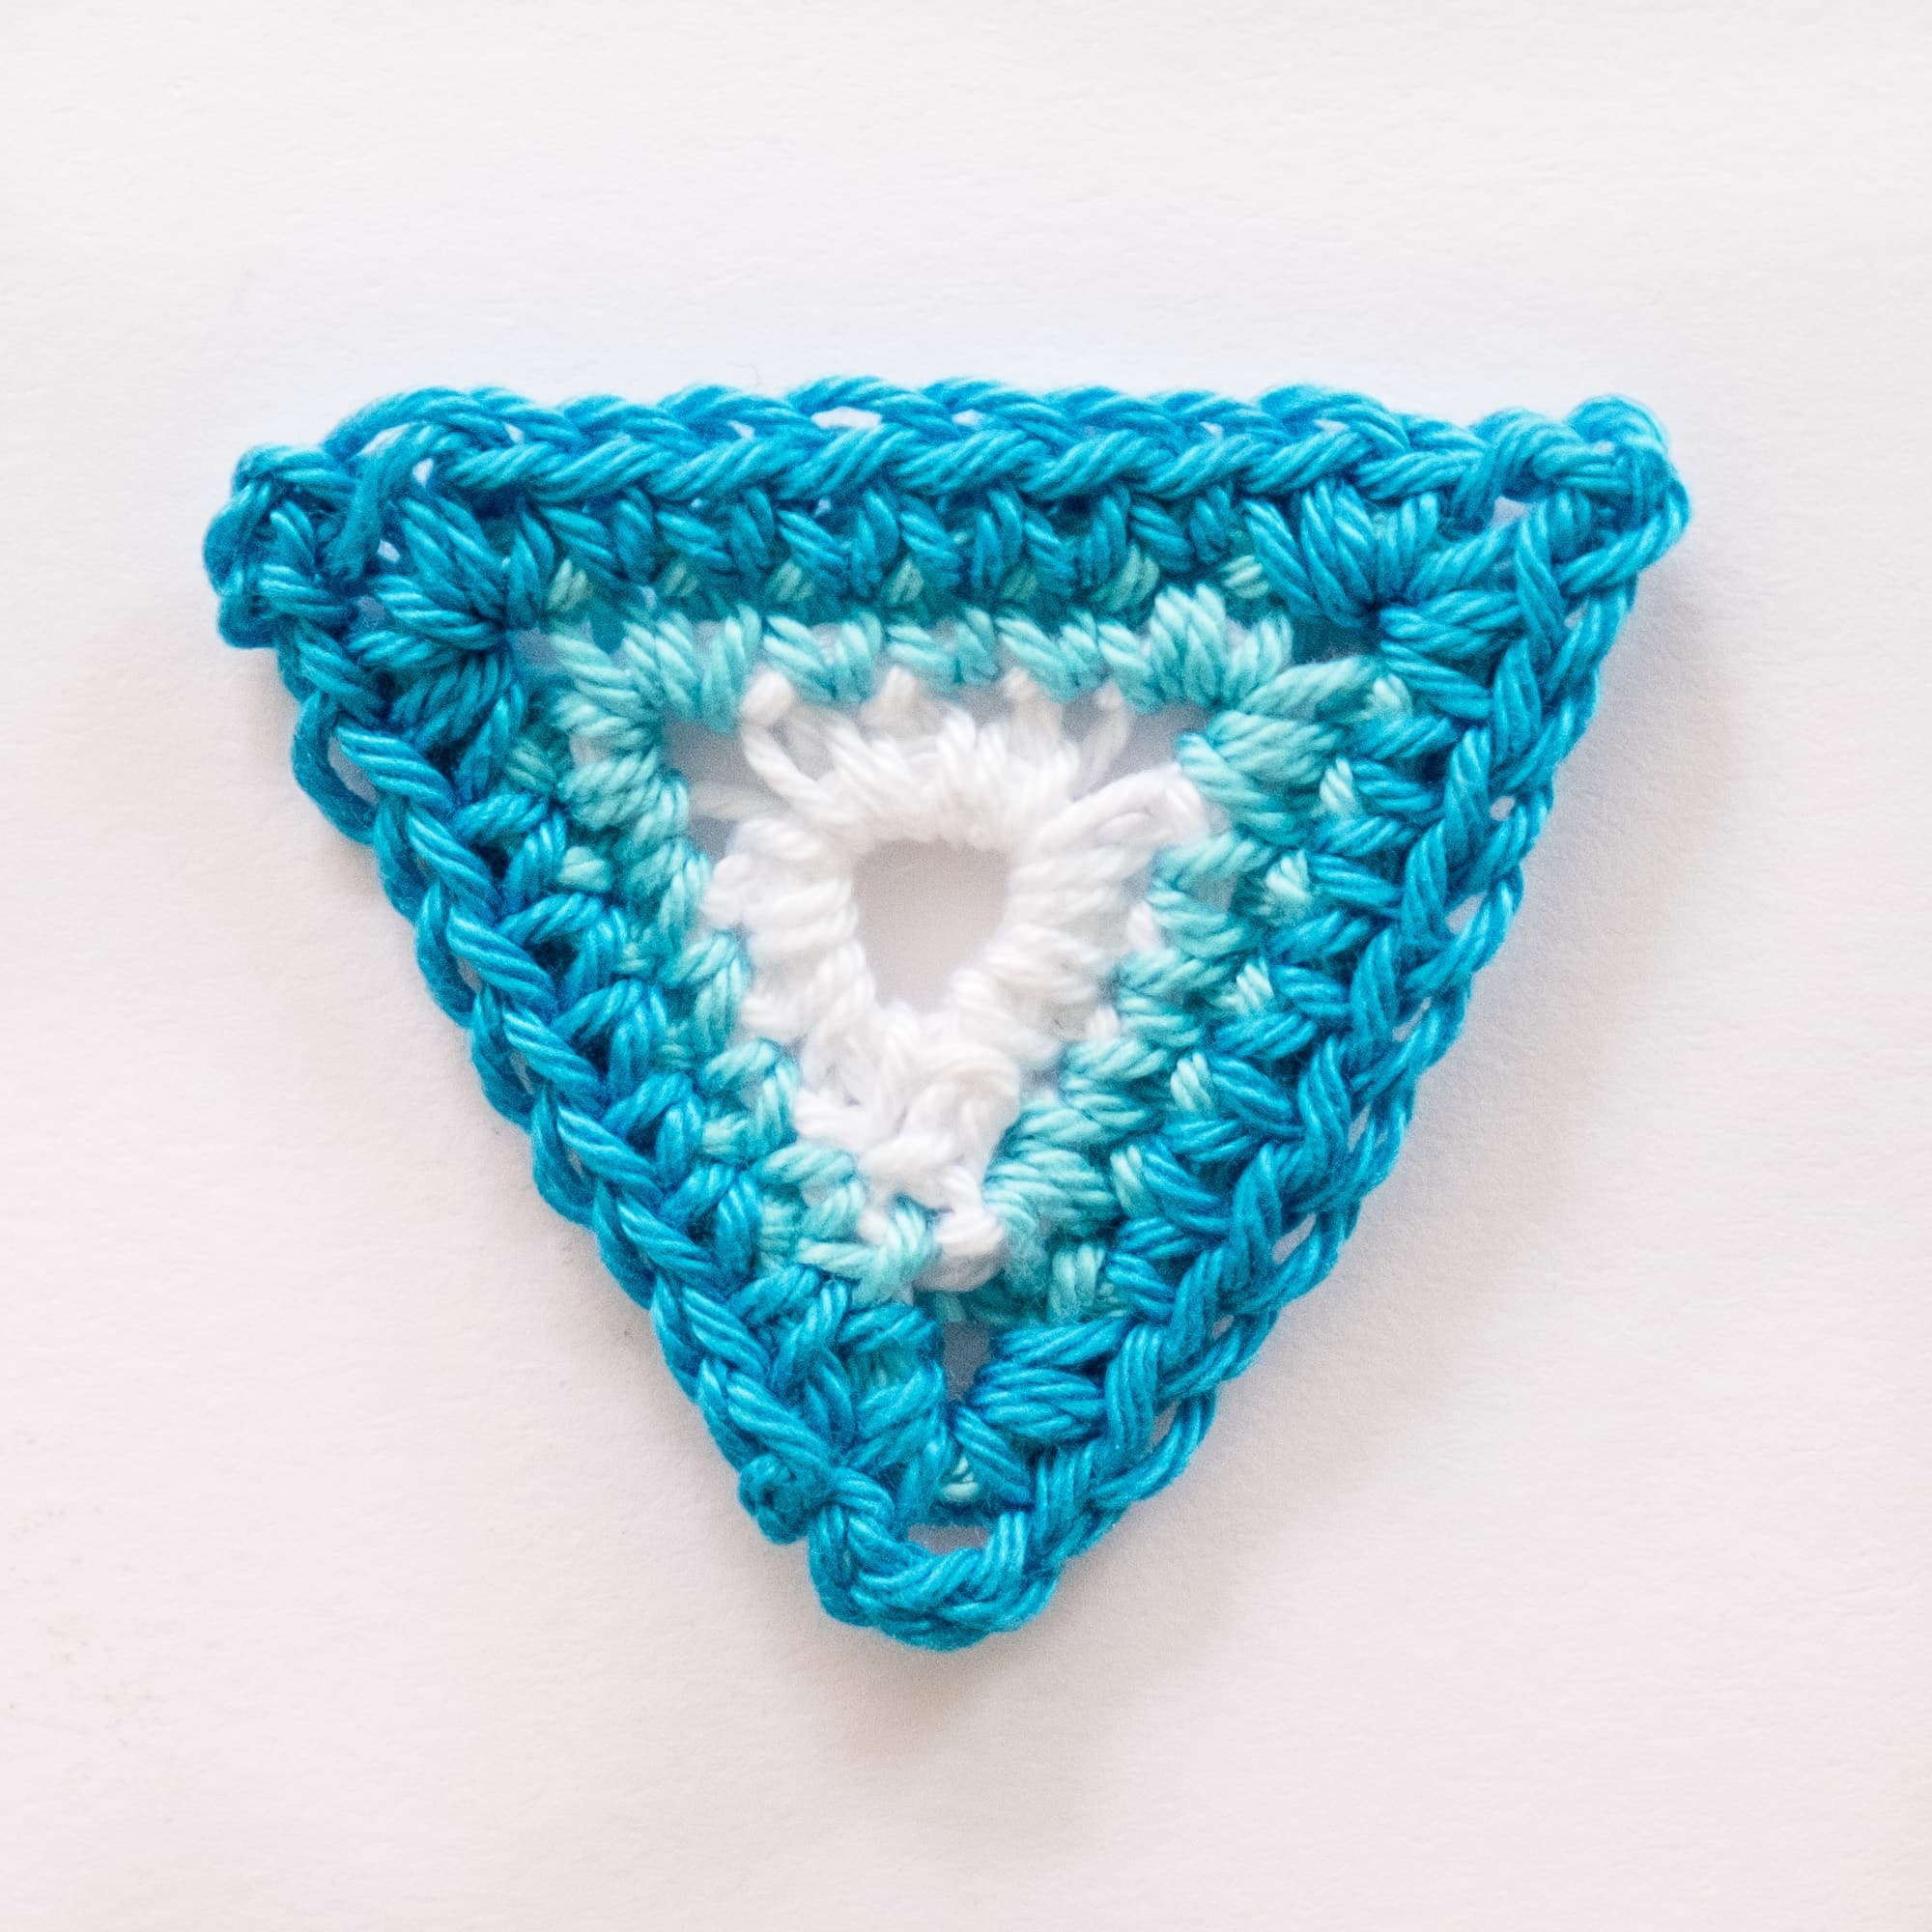 Triángulo de crochet azul .Ganchillo.